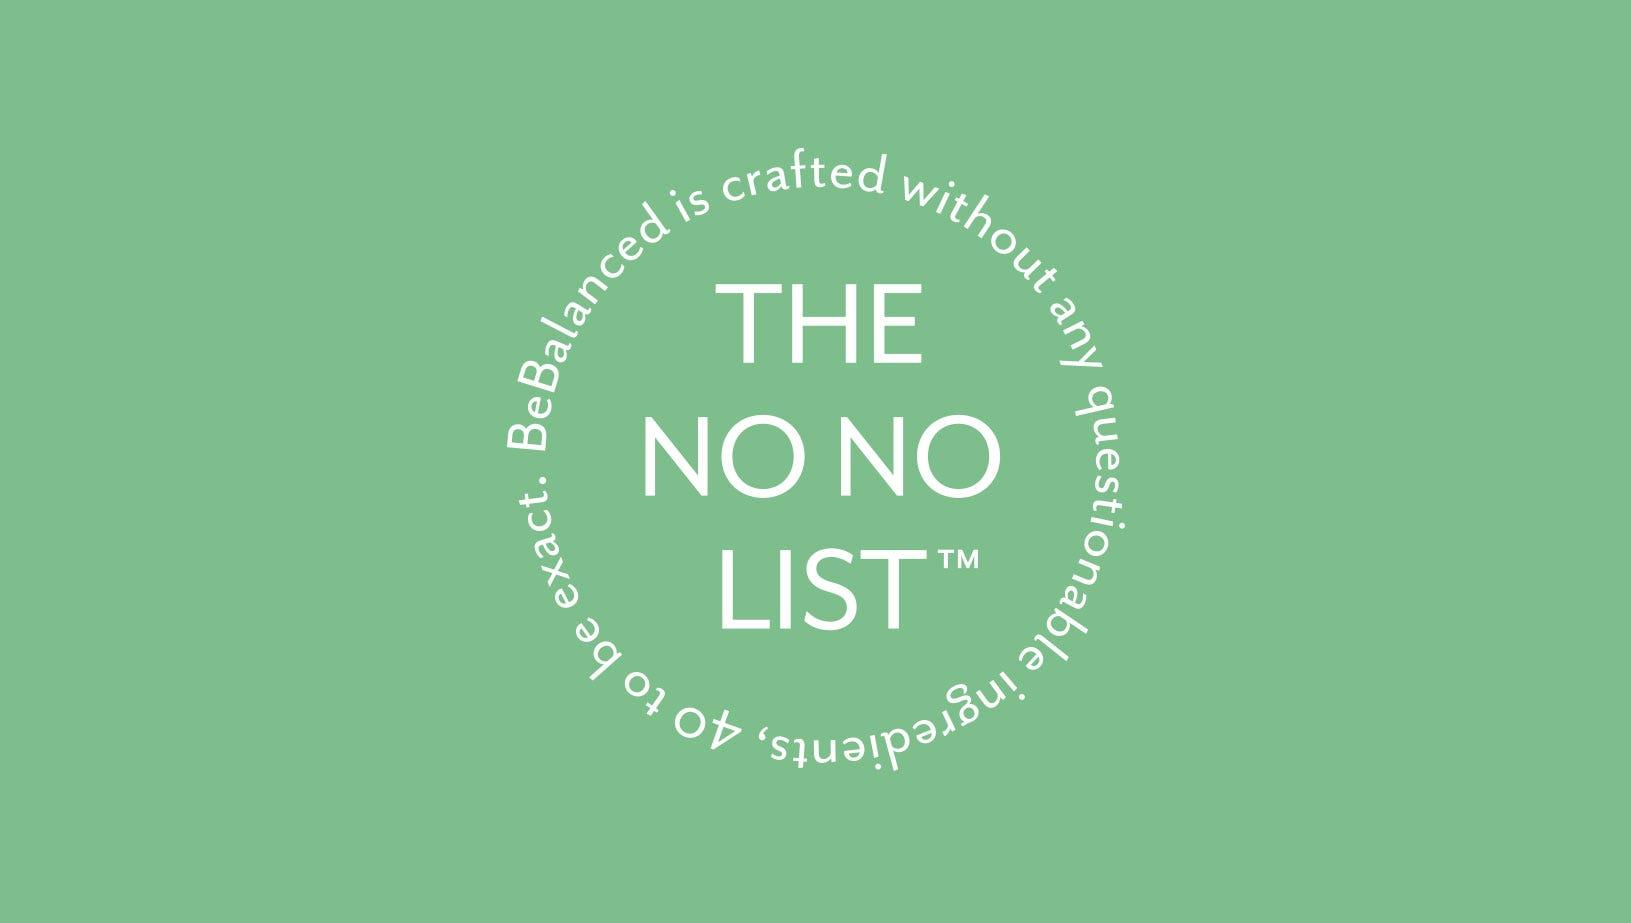 BeBalanced - No No List